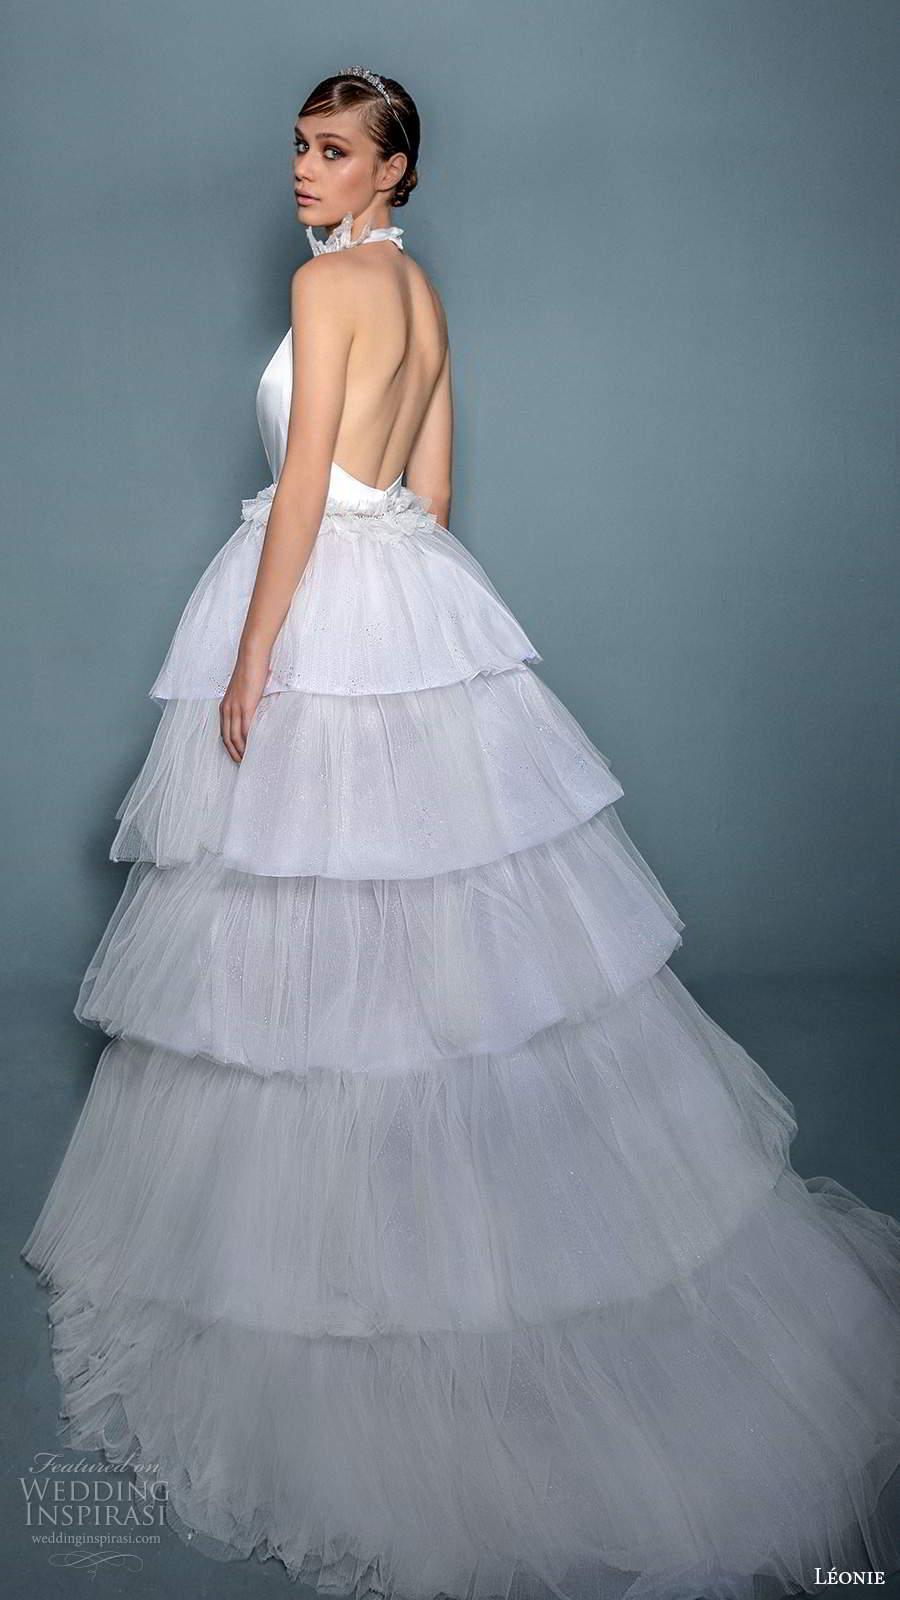 leonie bridal 2020 bridal sleeveless halter straps plunging v necklinen a line ball gown wedding dress slit skirt (10) bv